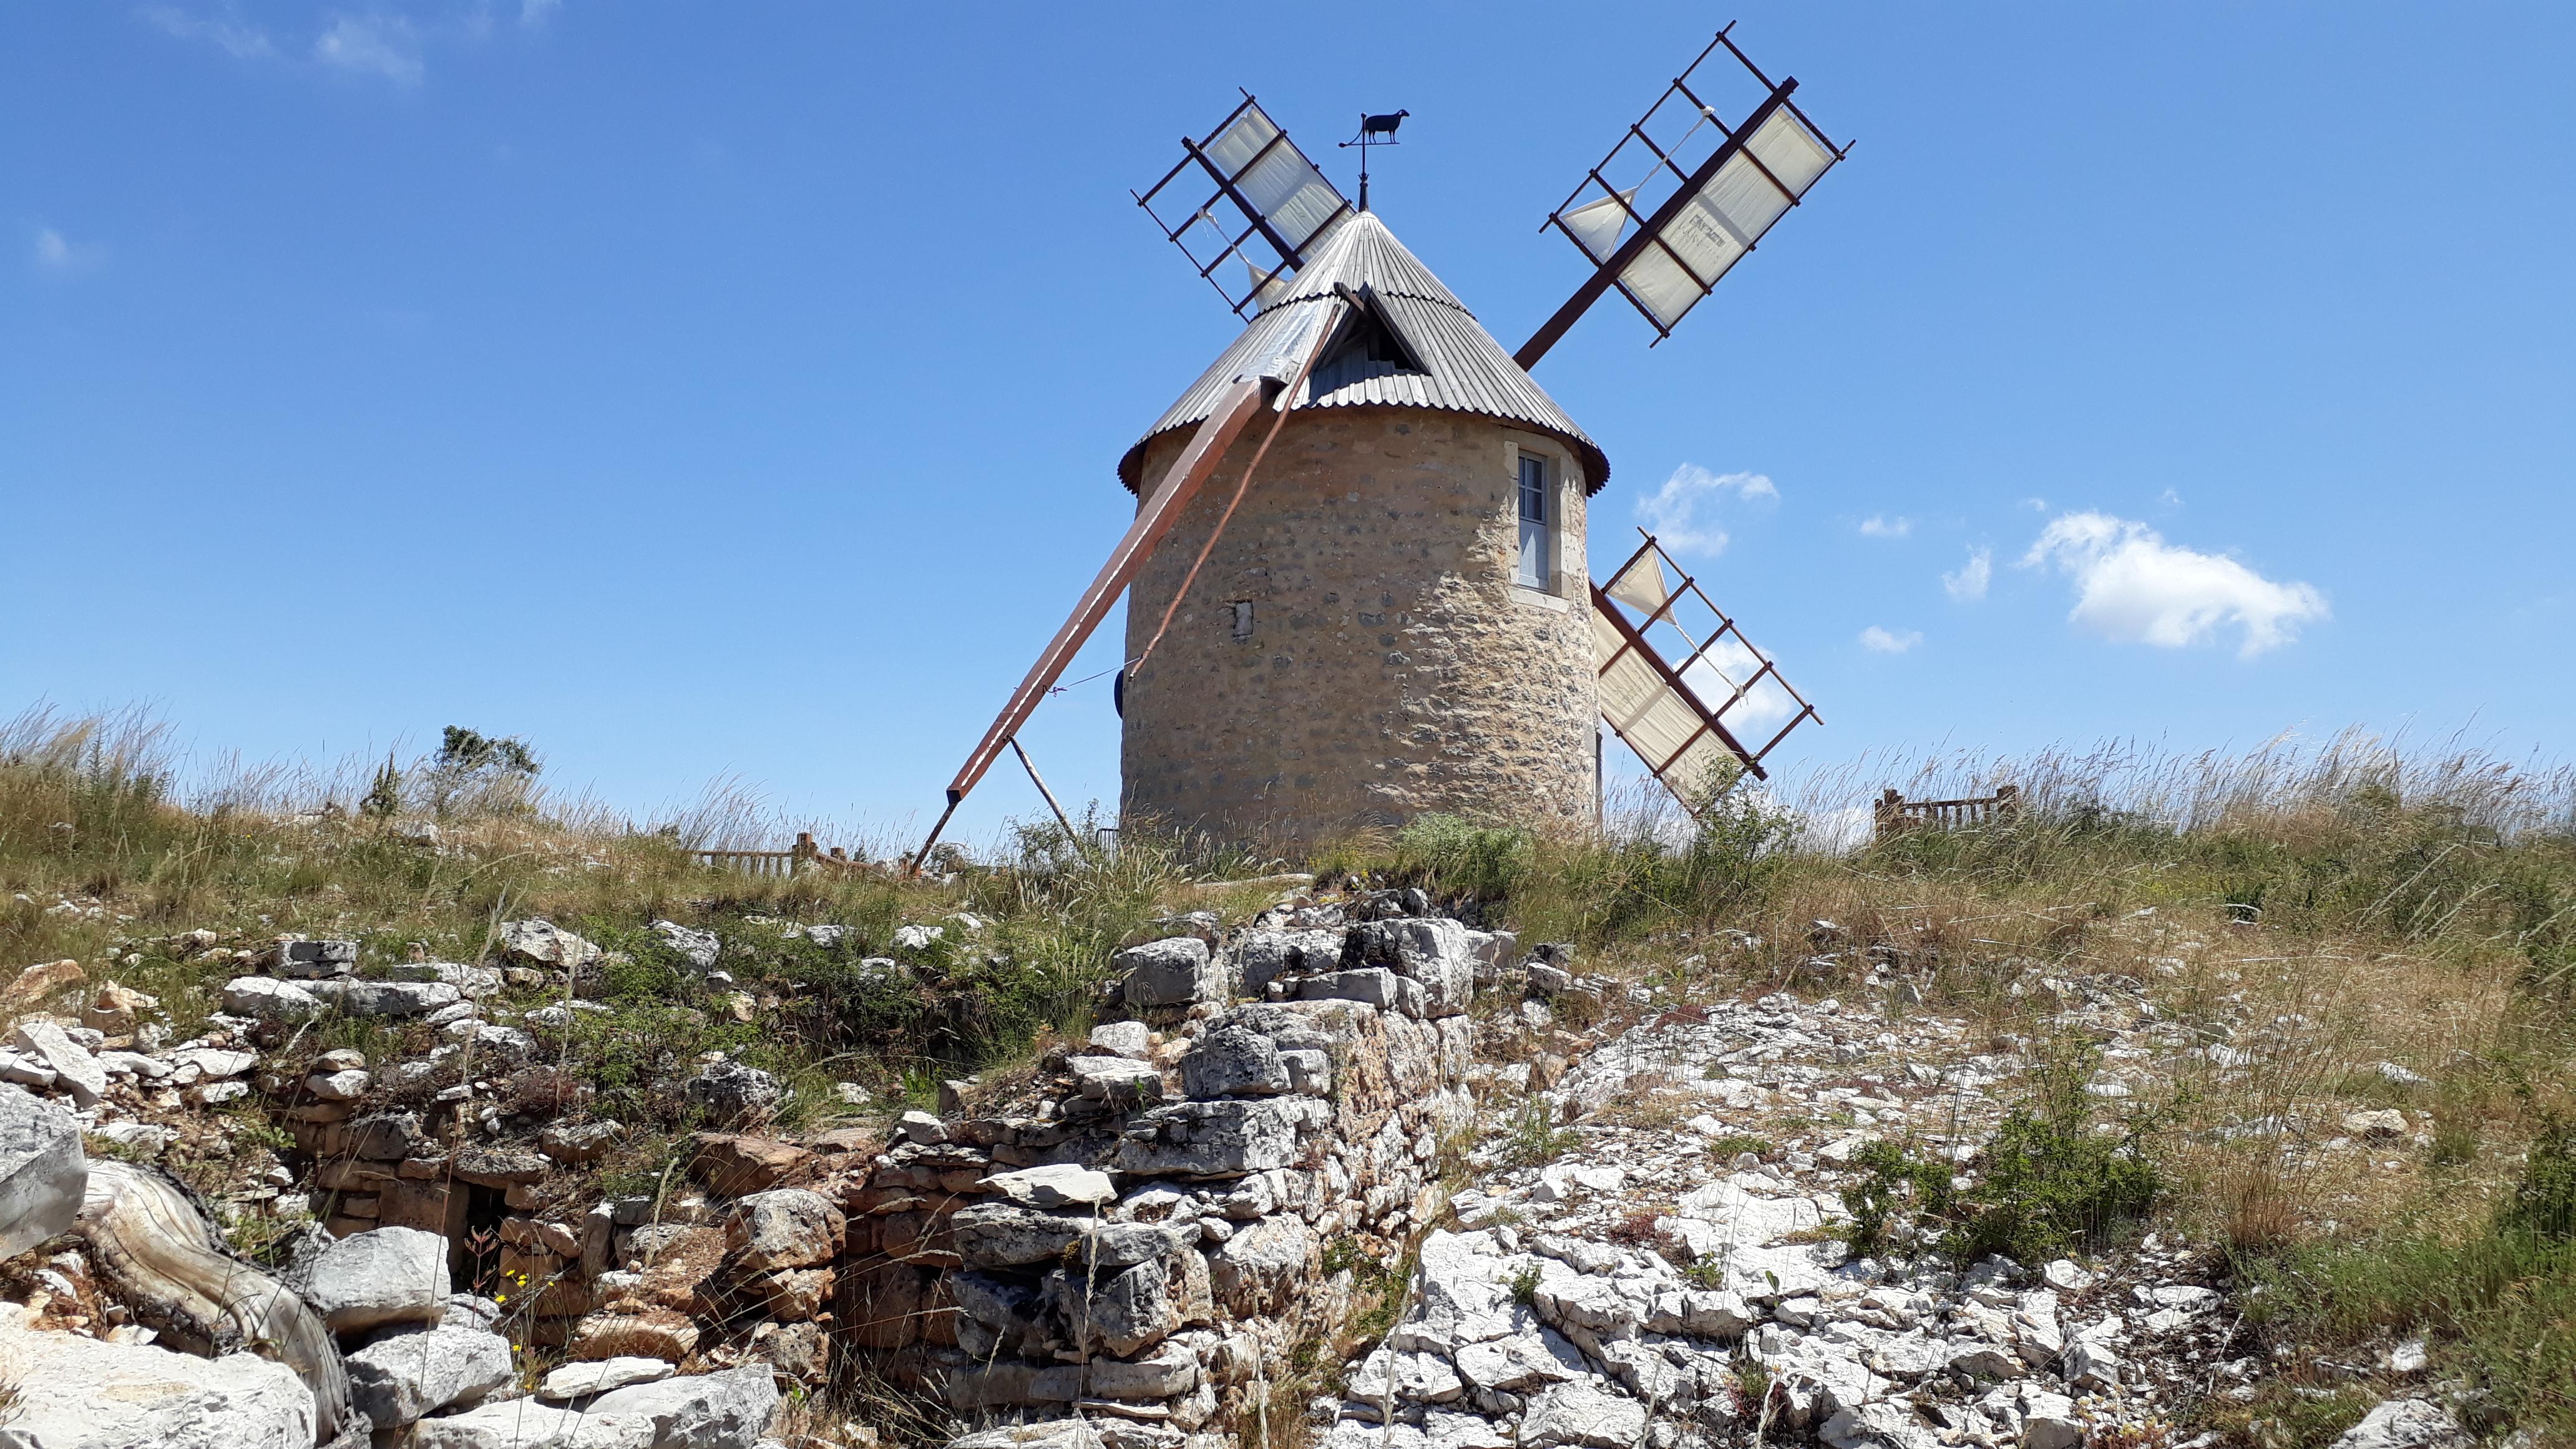 © Moulin de la Borie